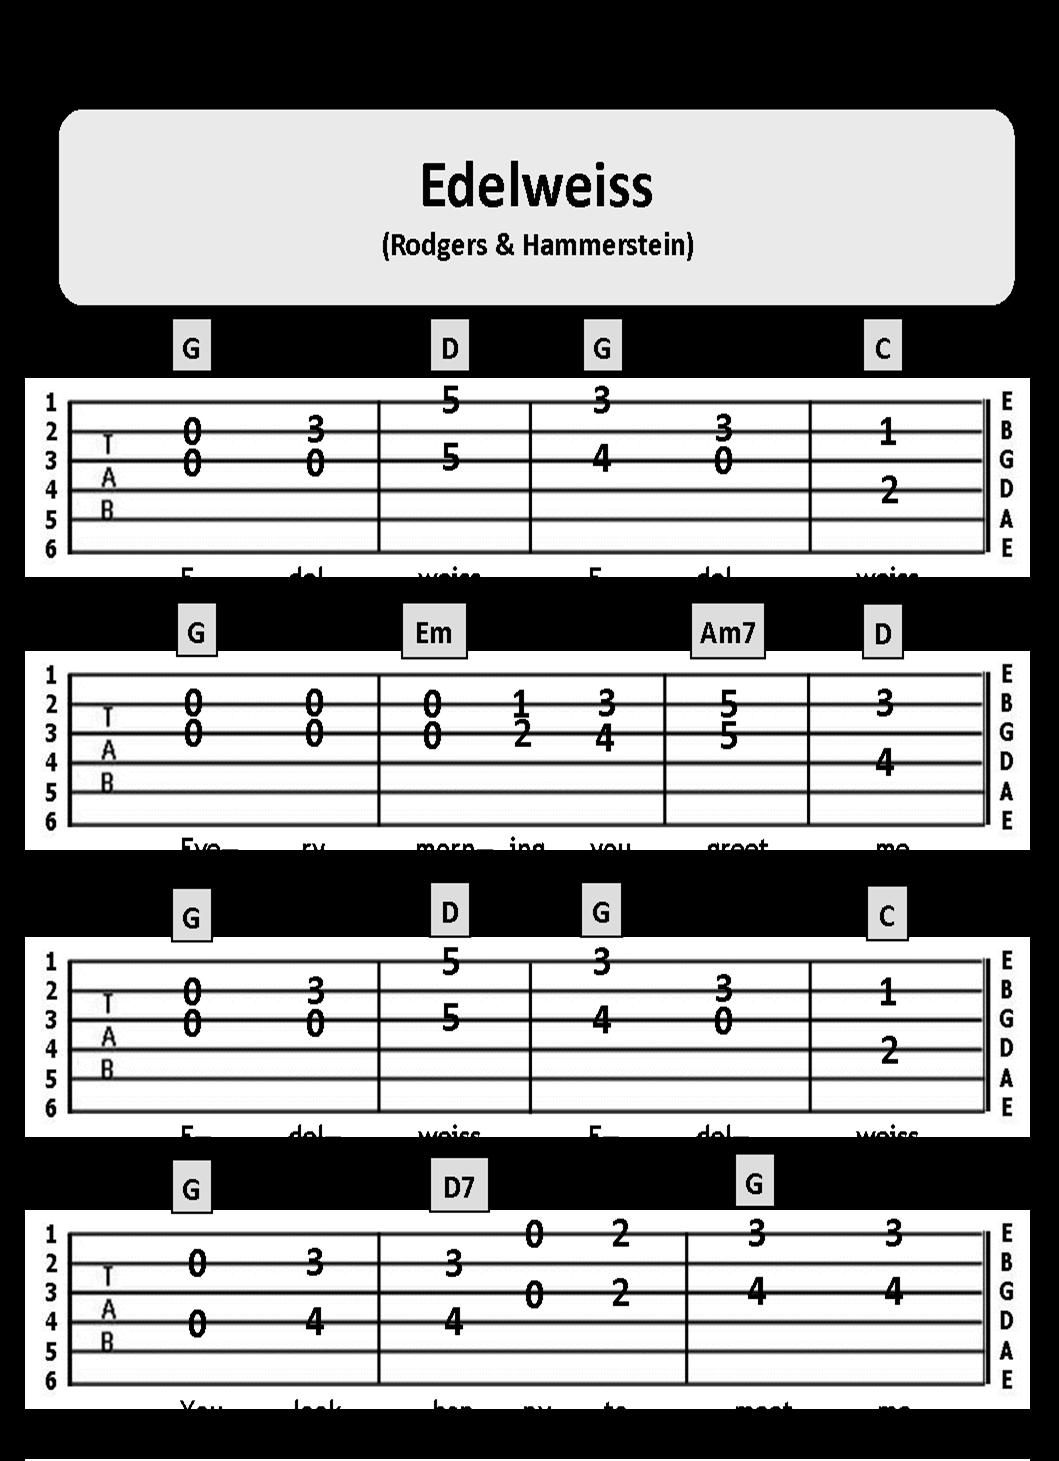 Edelweiss Chords